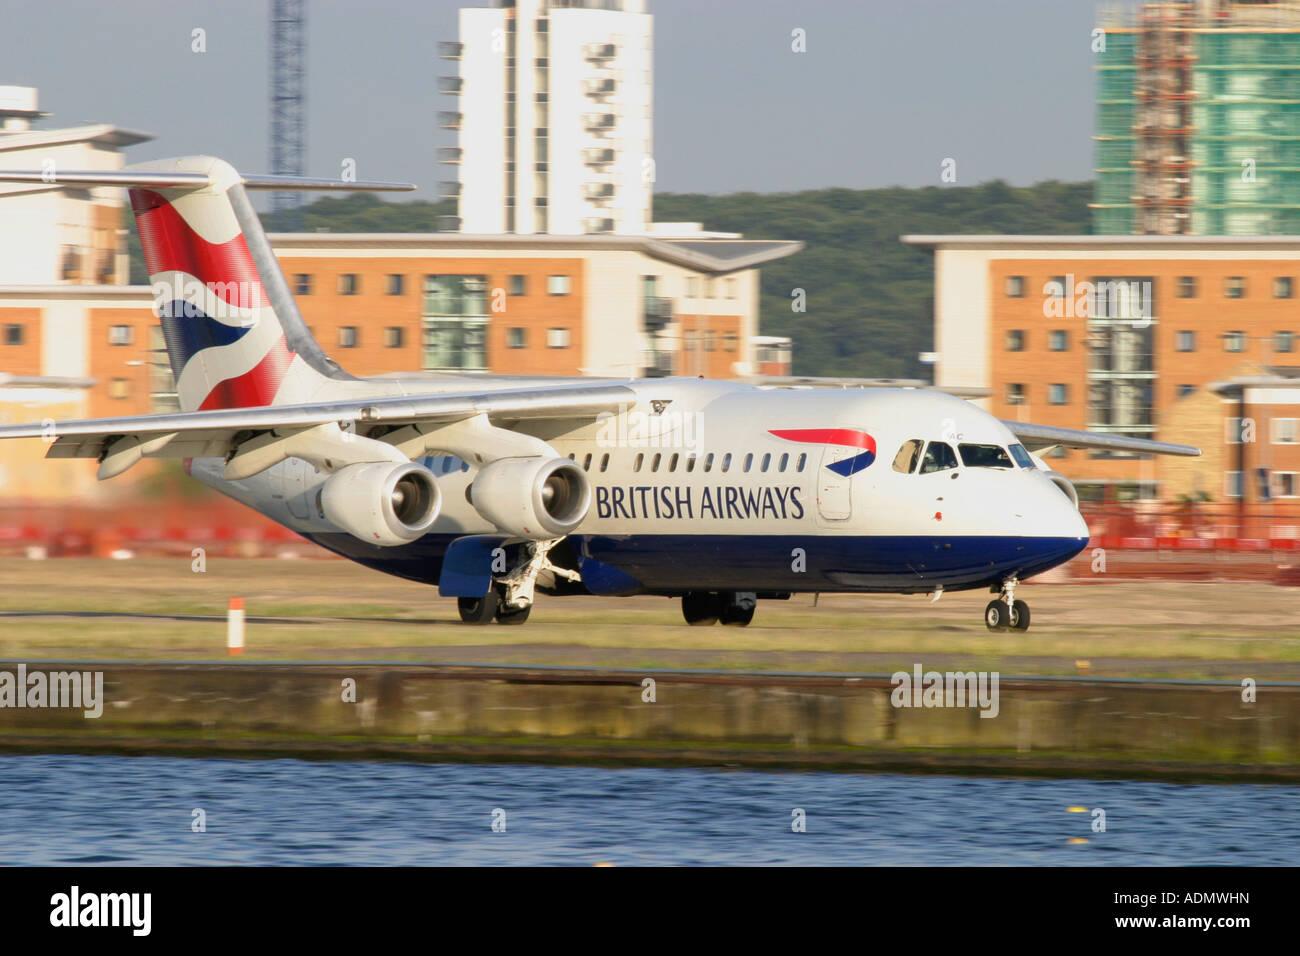 British Airways regional jet - Stock Image